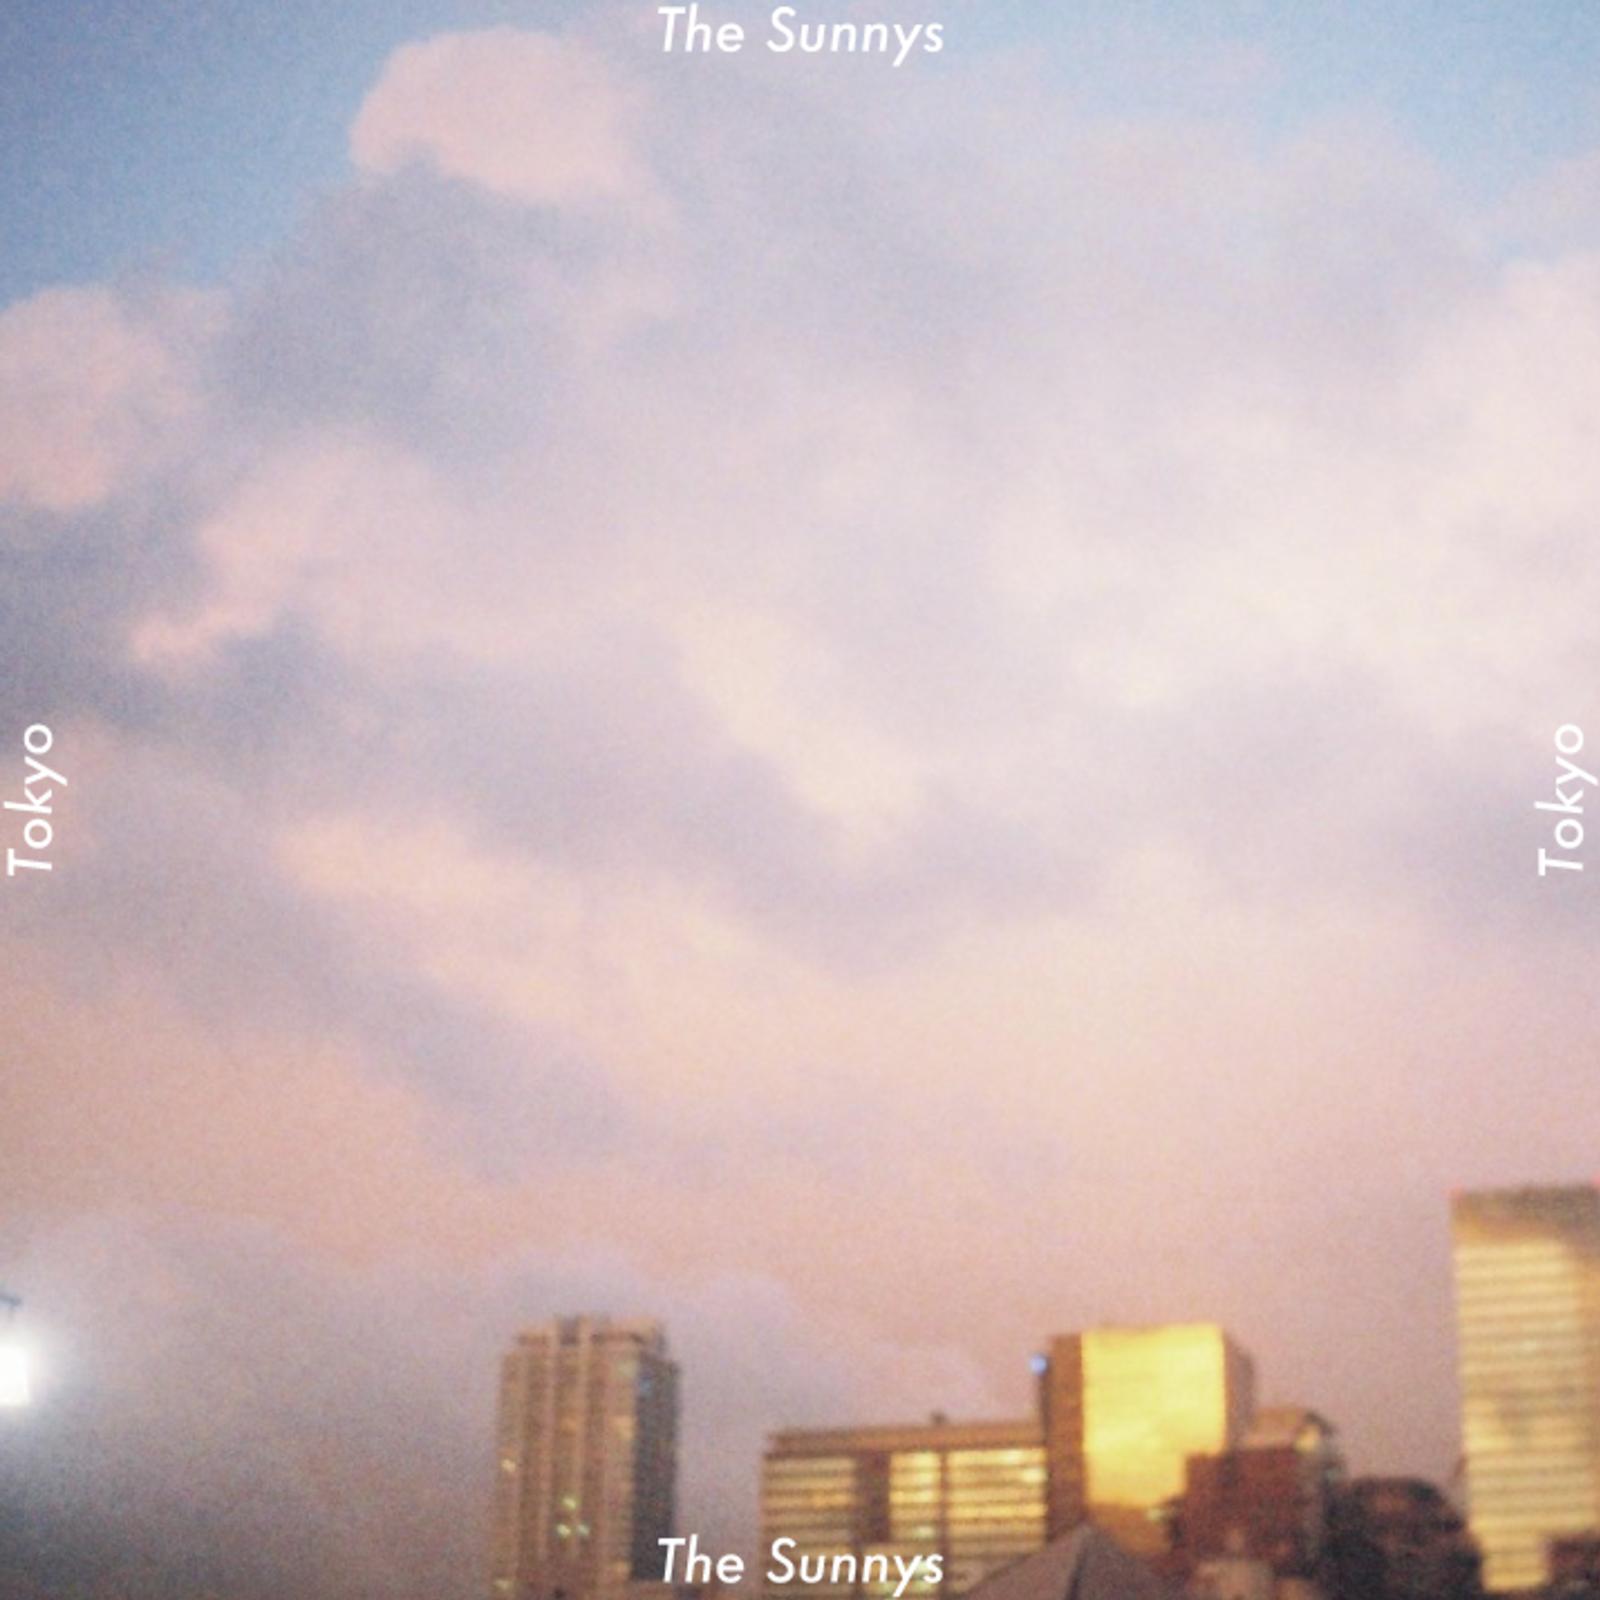 The Sunnys